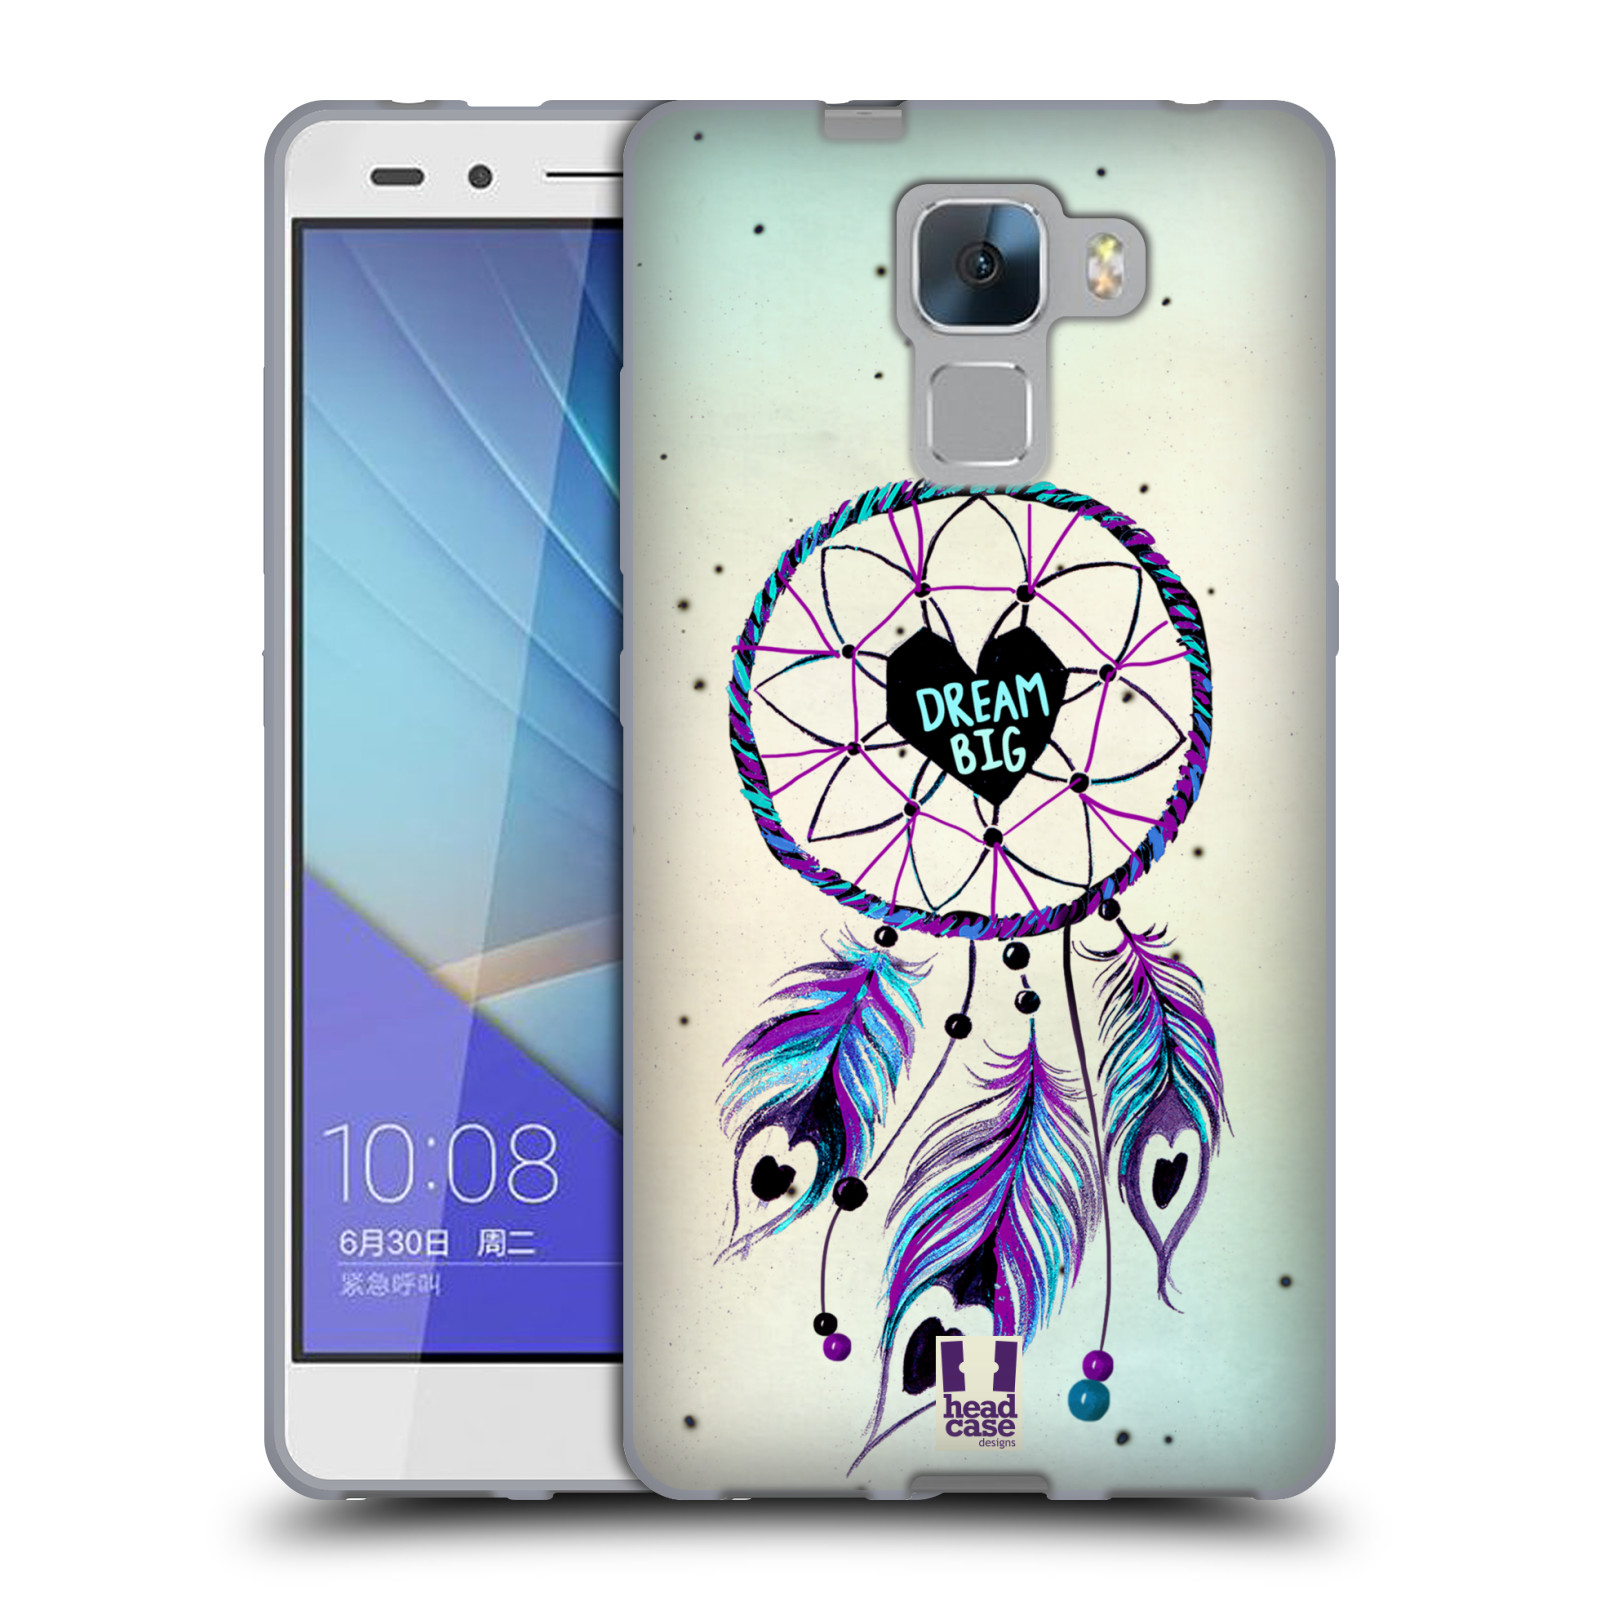 Silikonové pouzdro na mobil Honor 7 HEAD CASE Lapač Assorted Dream Big Srdce